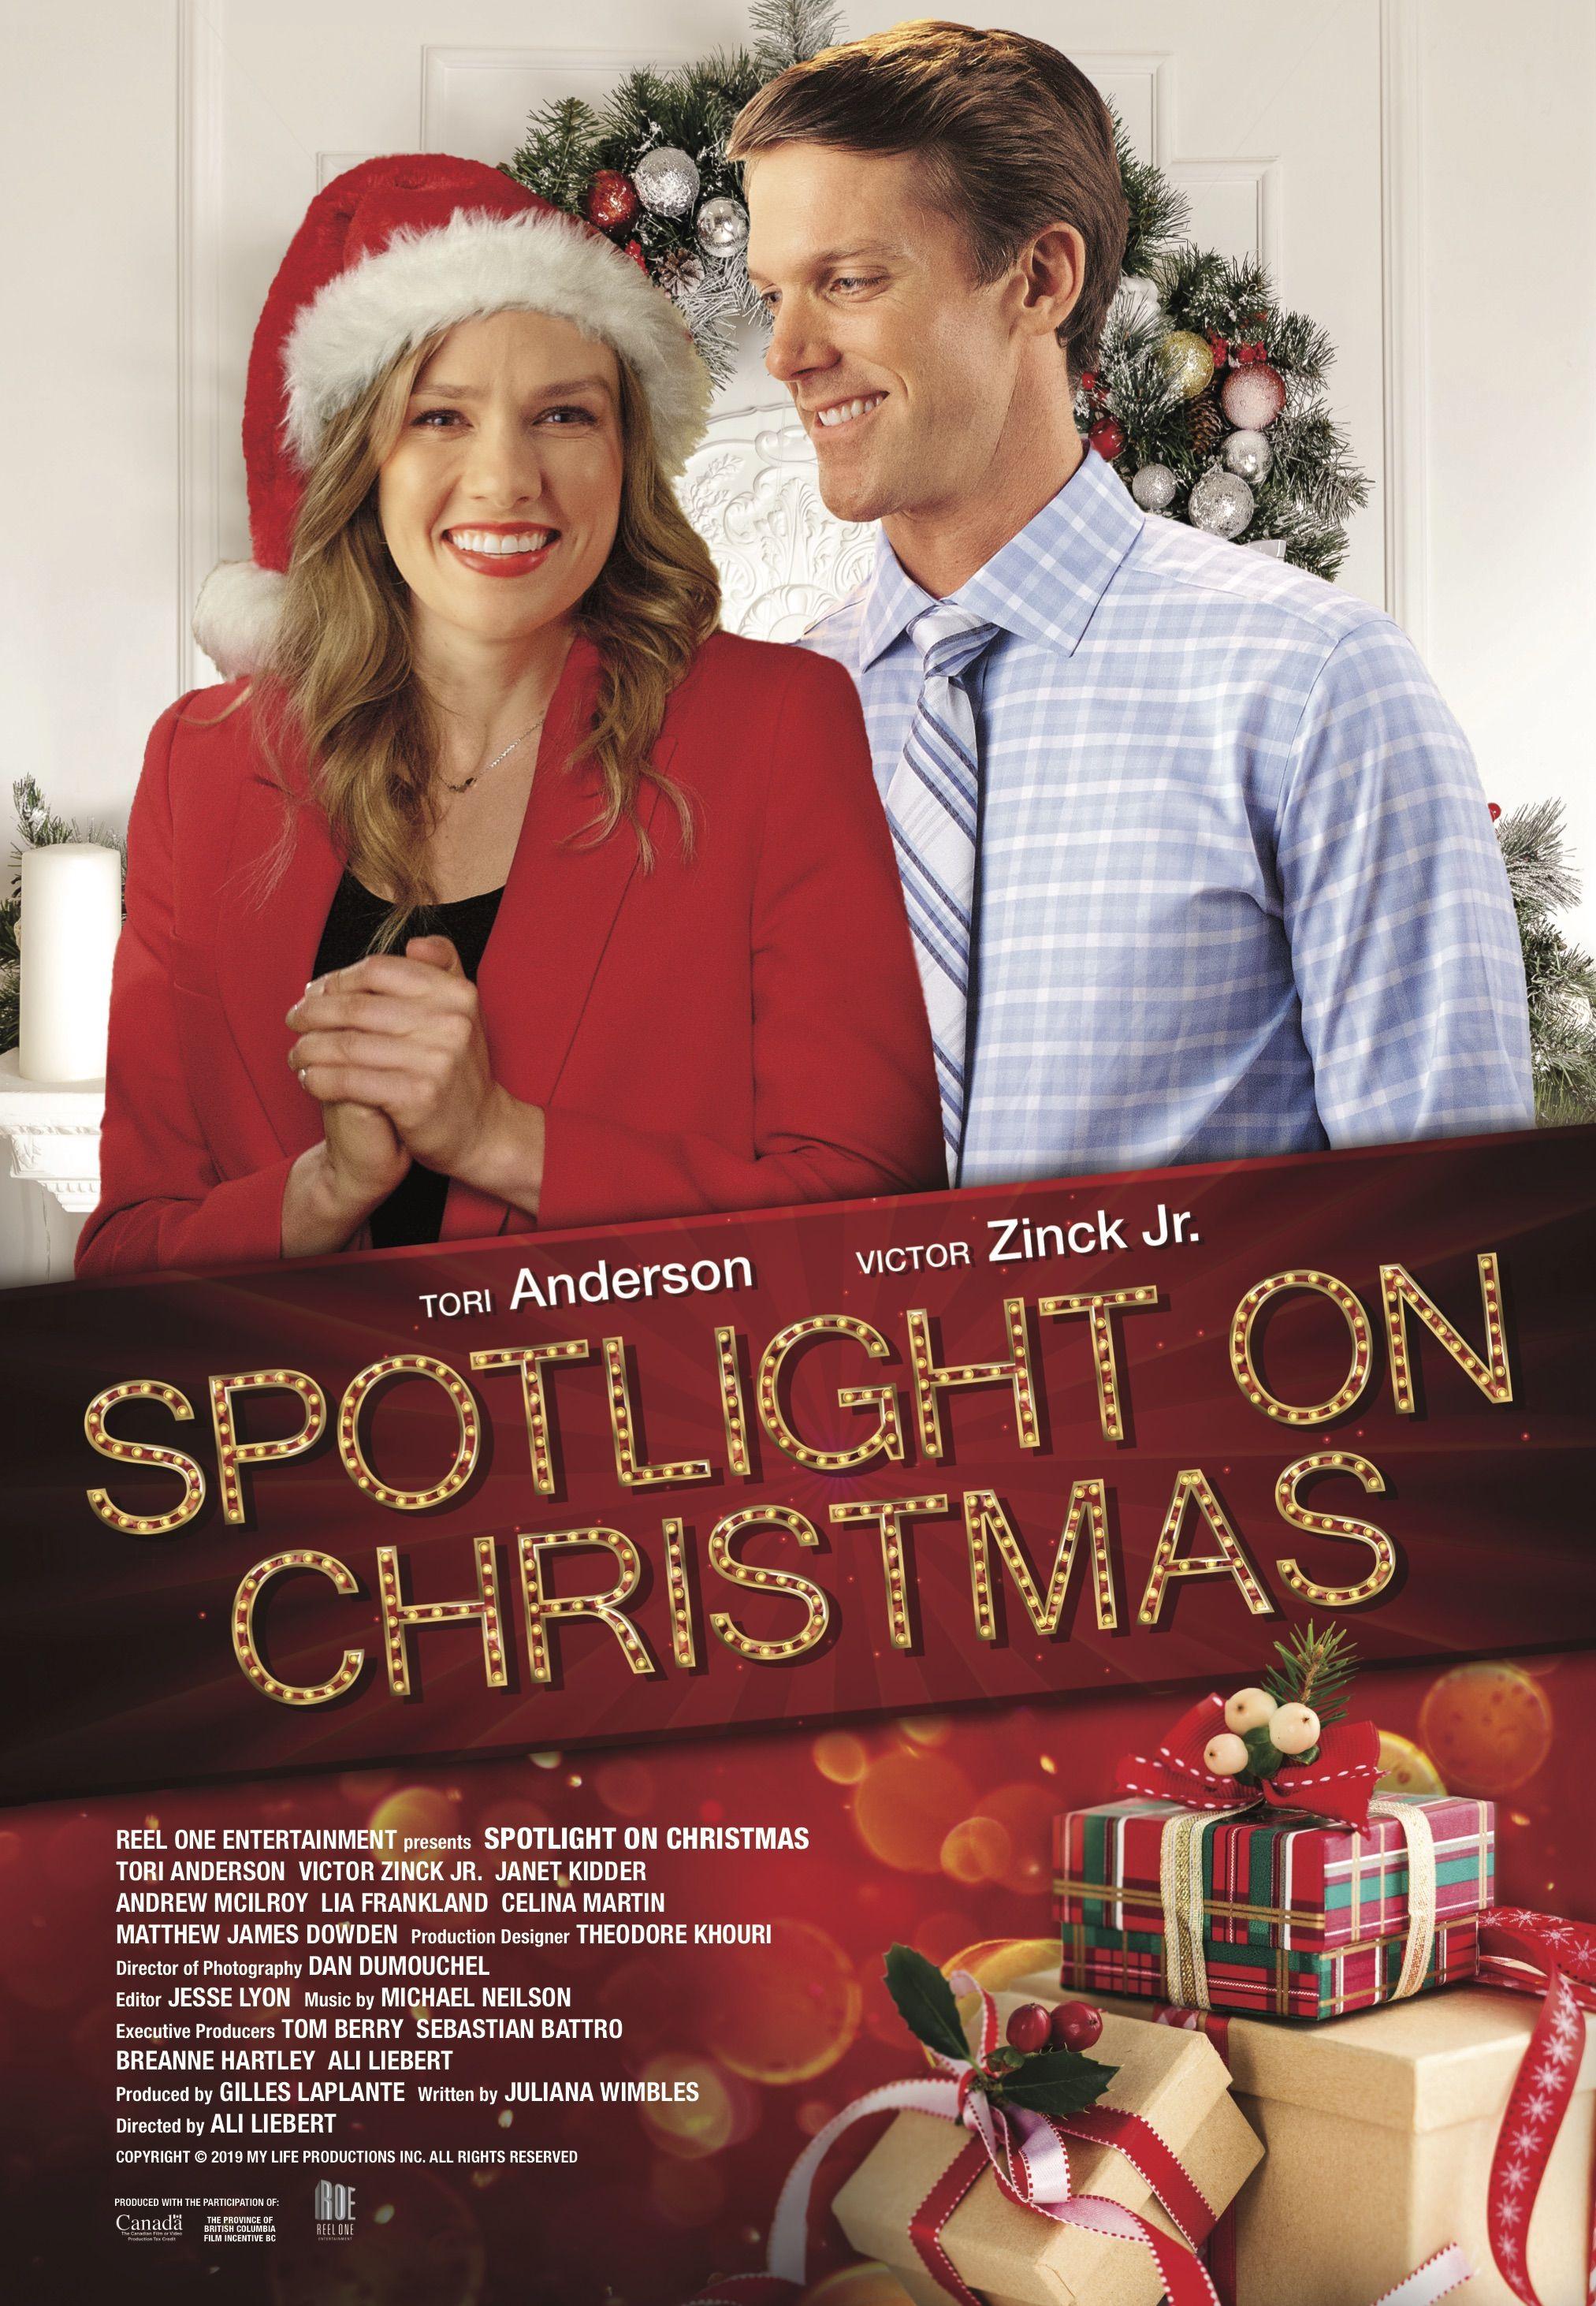 2020 Lifetime Christmas Movies In 2020 Hallmark Christmas Movies Christmas Movies Hallmark Movies